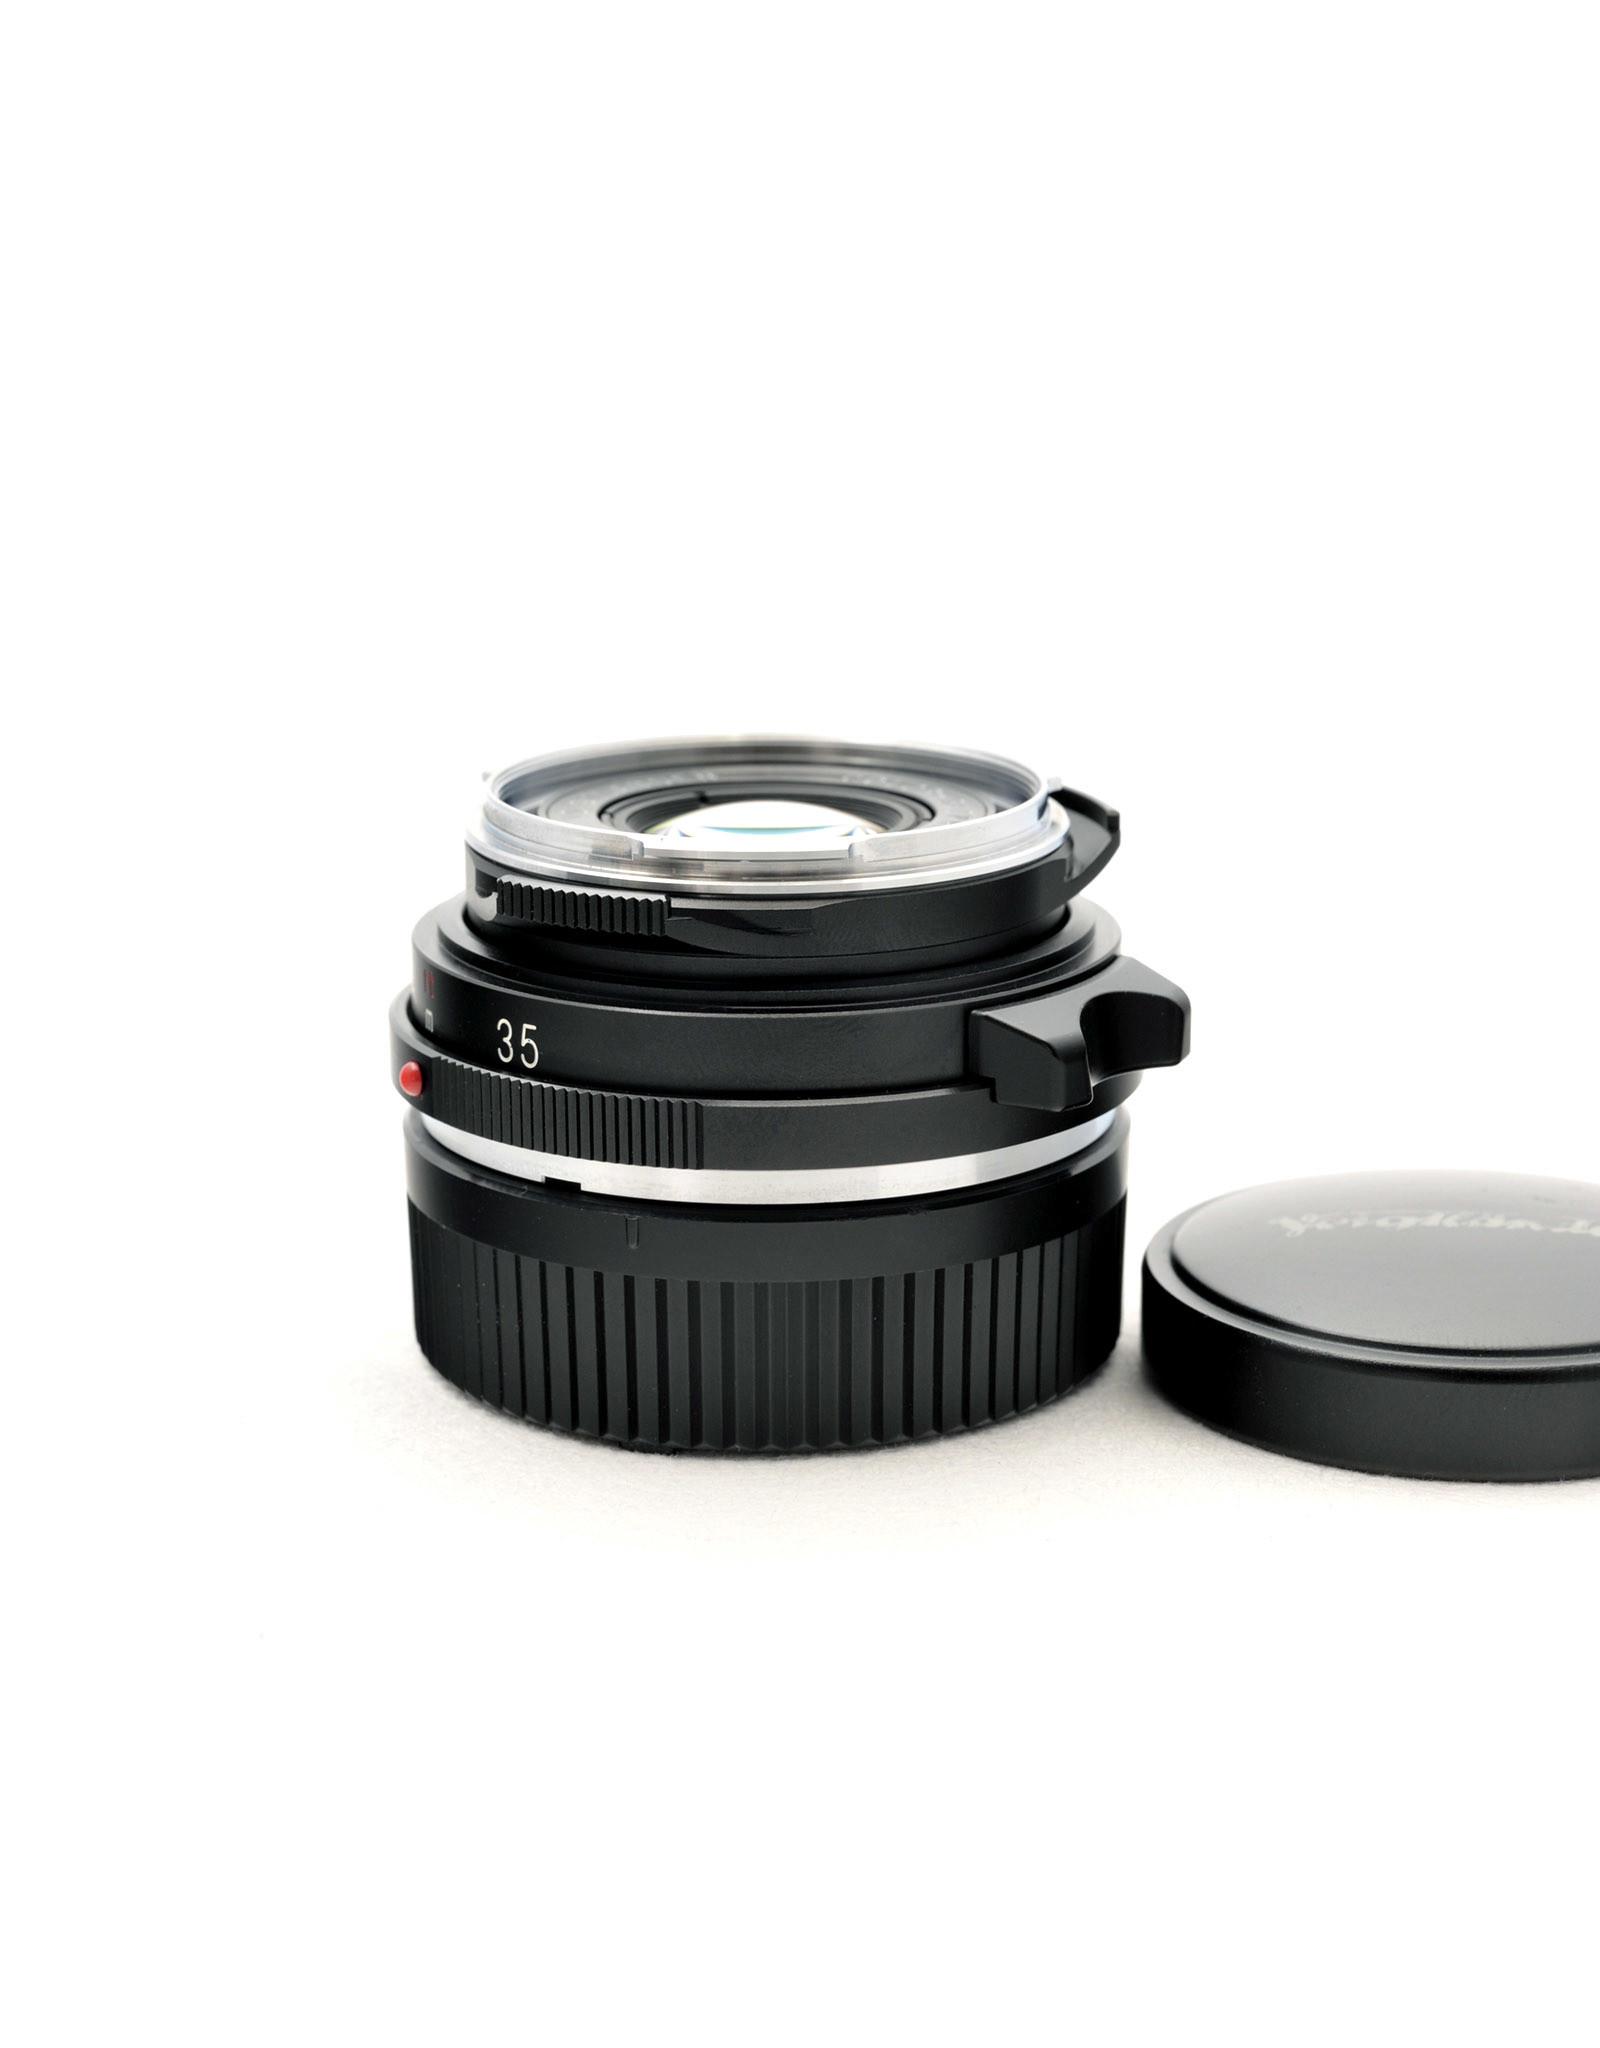 Voigtlander Voigtlander 35mm f2.5 Color-Skopar P VM II   AP1051506